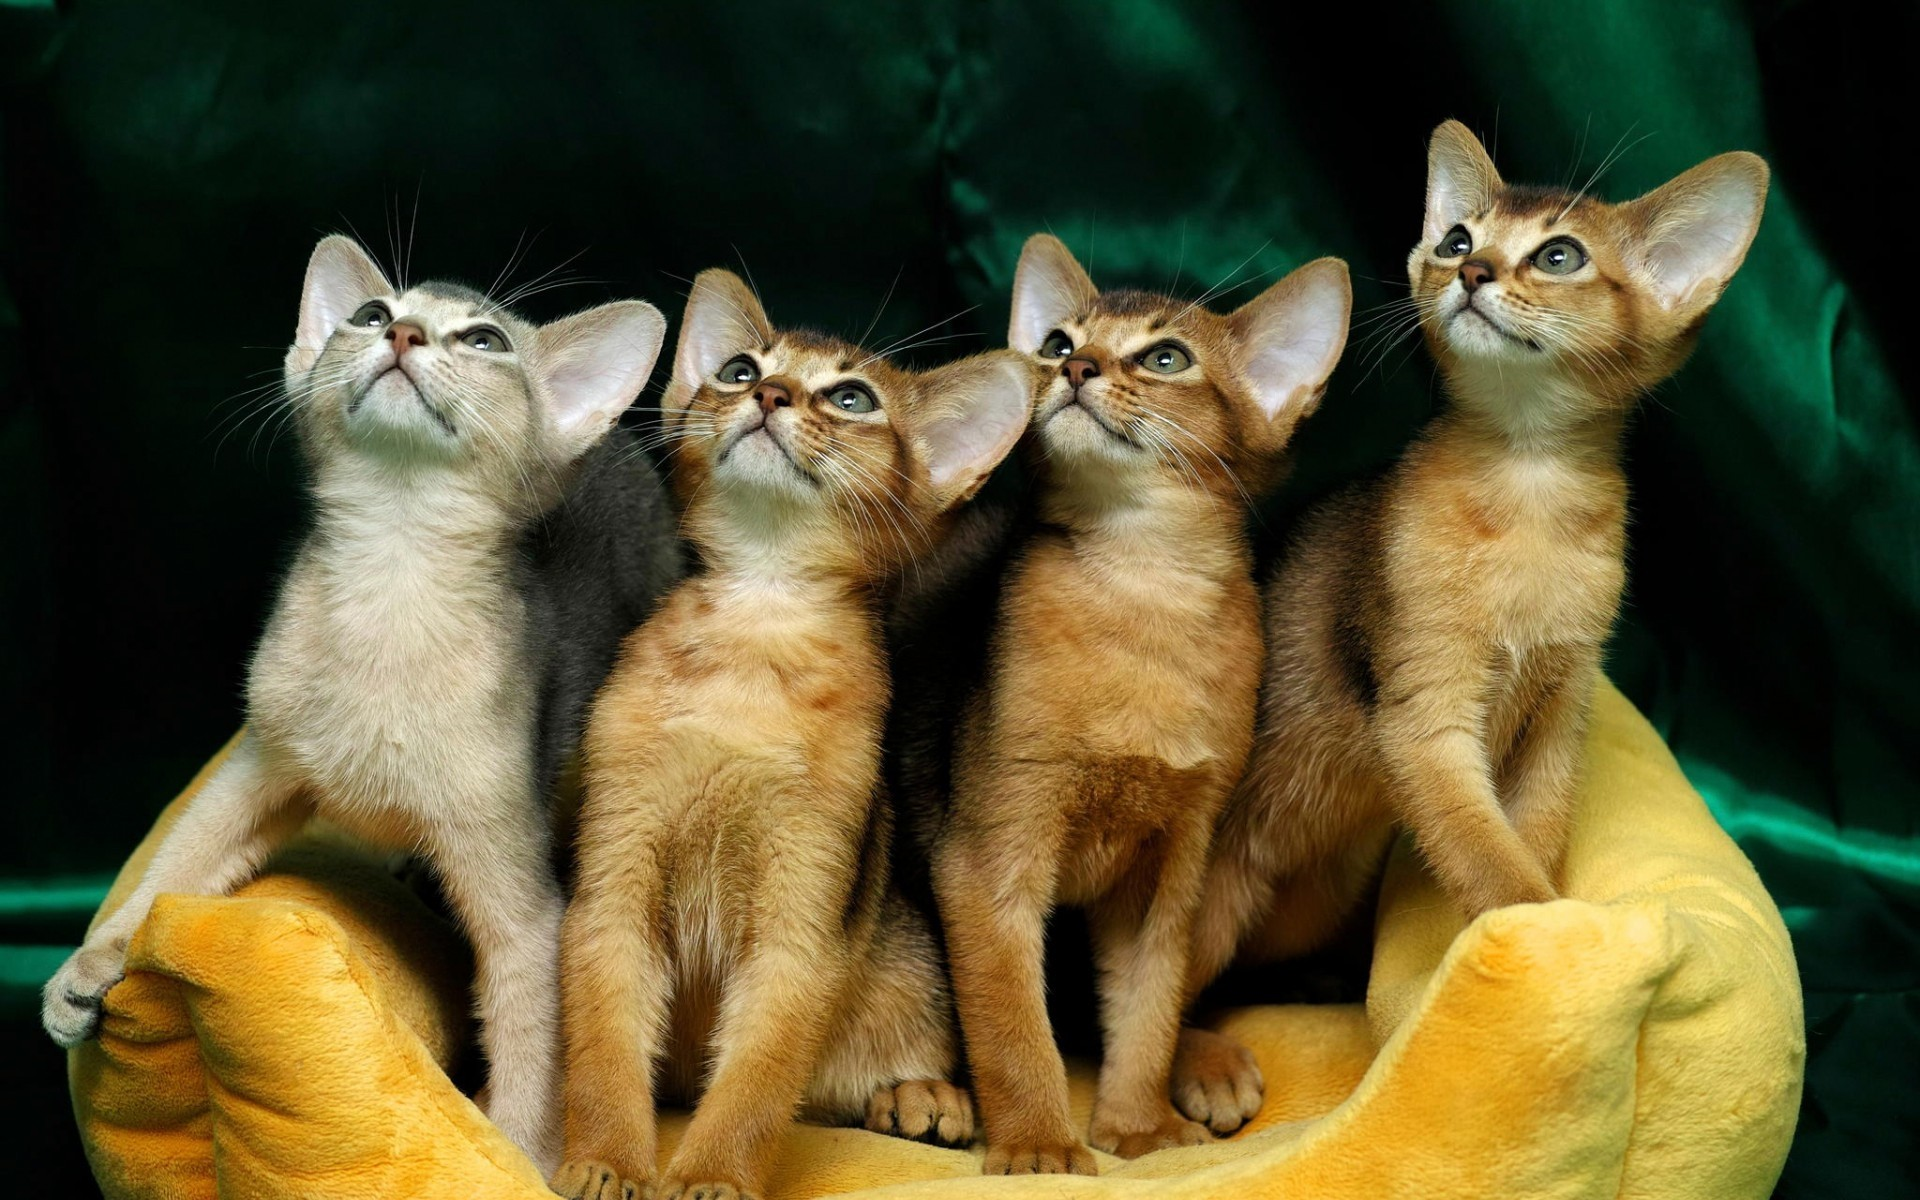 смотрю картинки с котиками